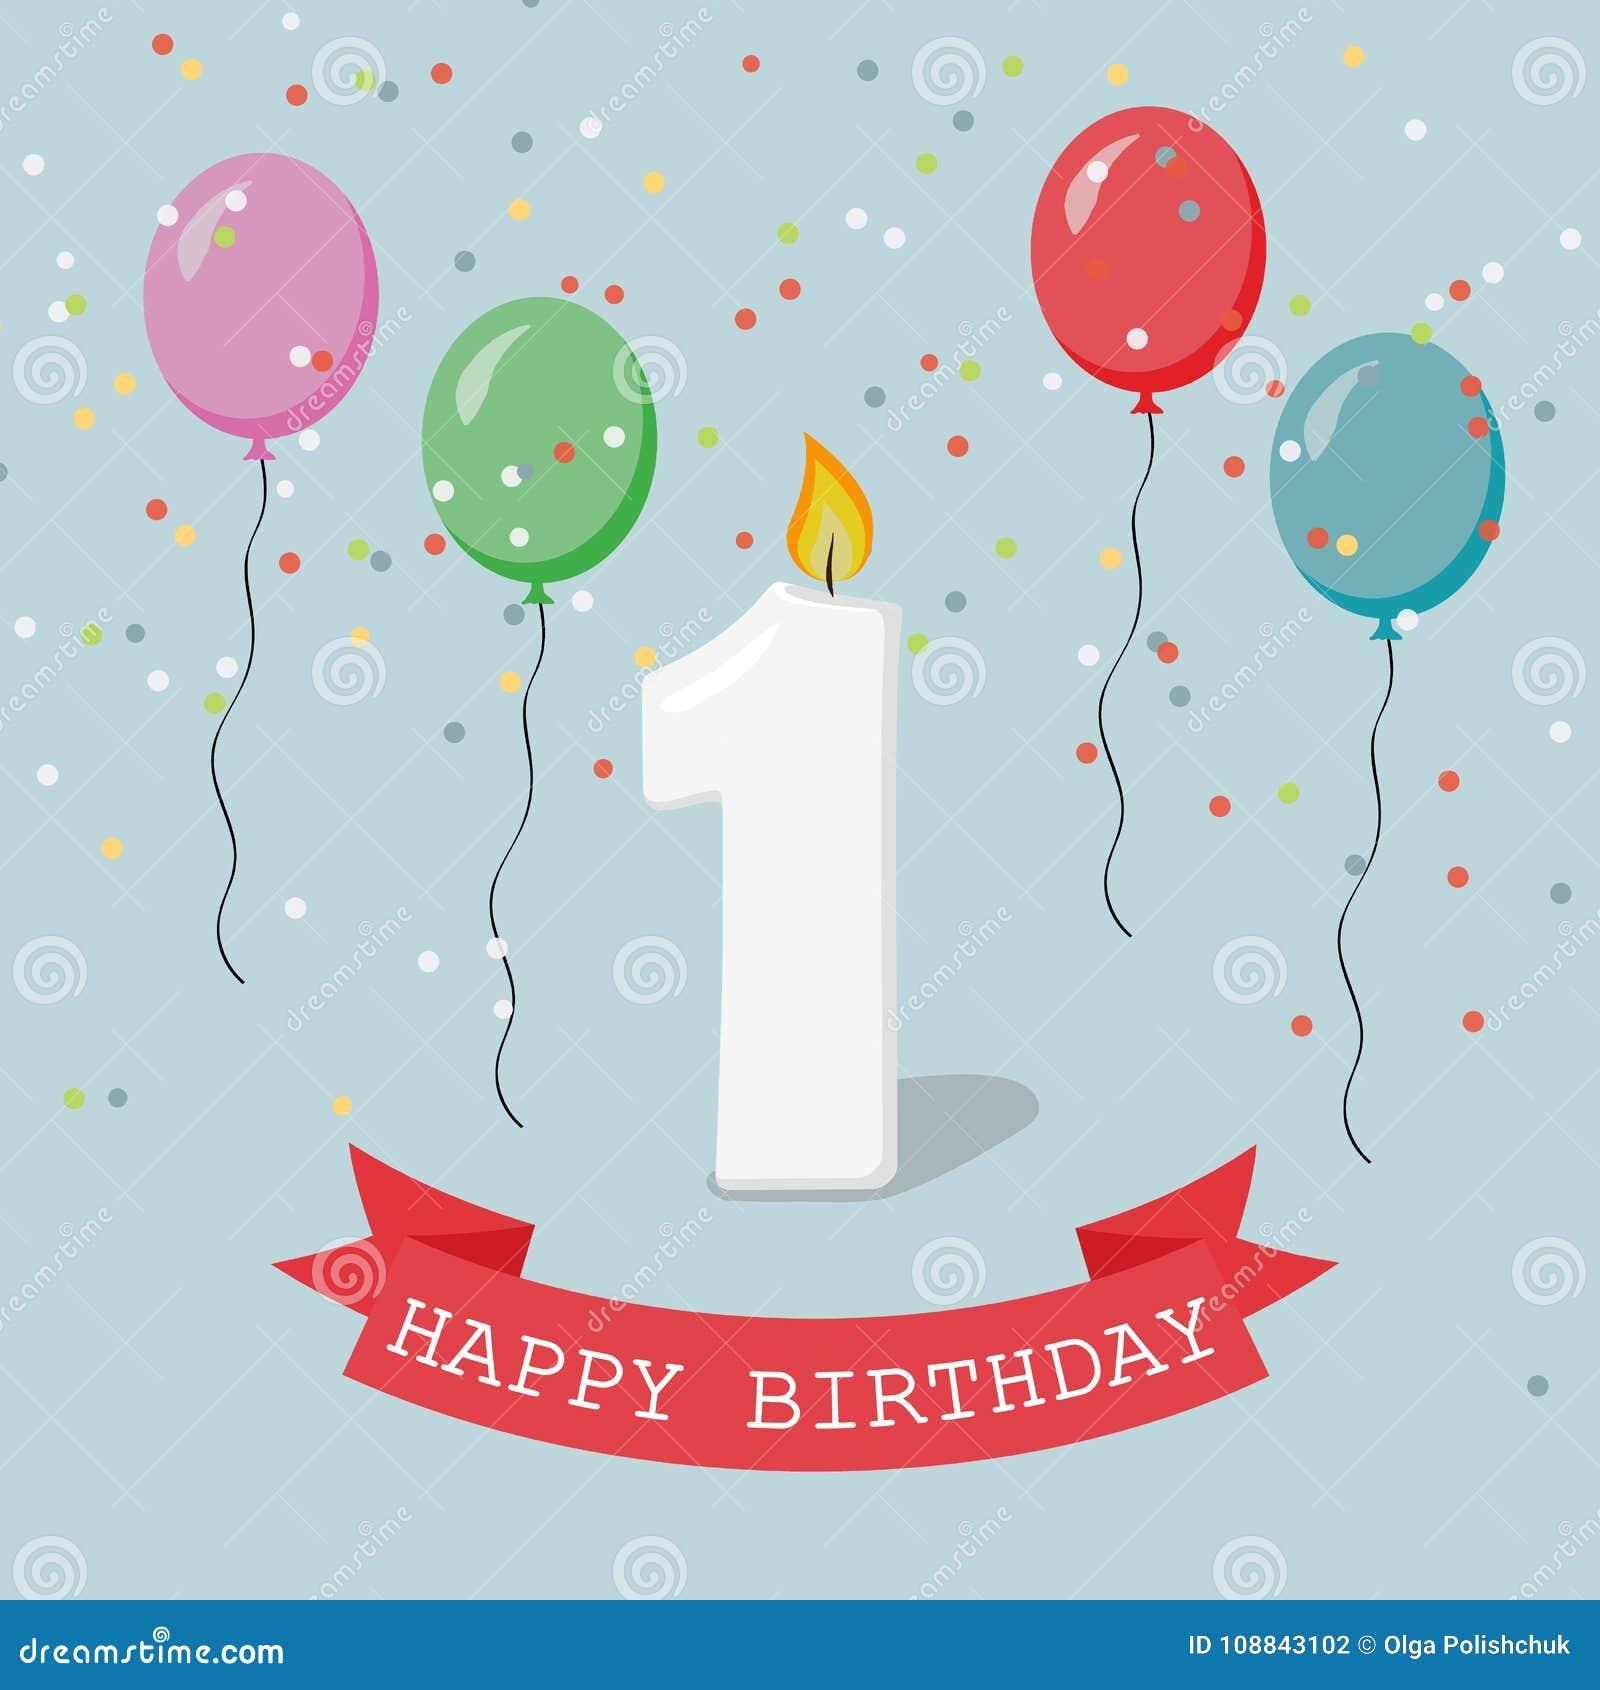 Happy first birthday anniversary greeting card with number one stock happy first birthday anniversary greeting card with number one m4hsunfo